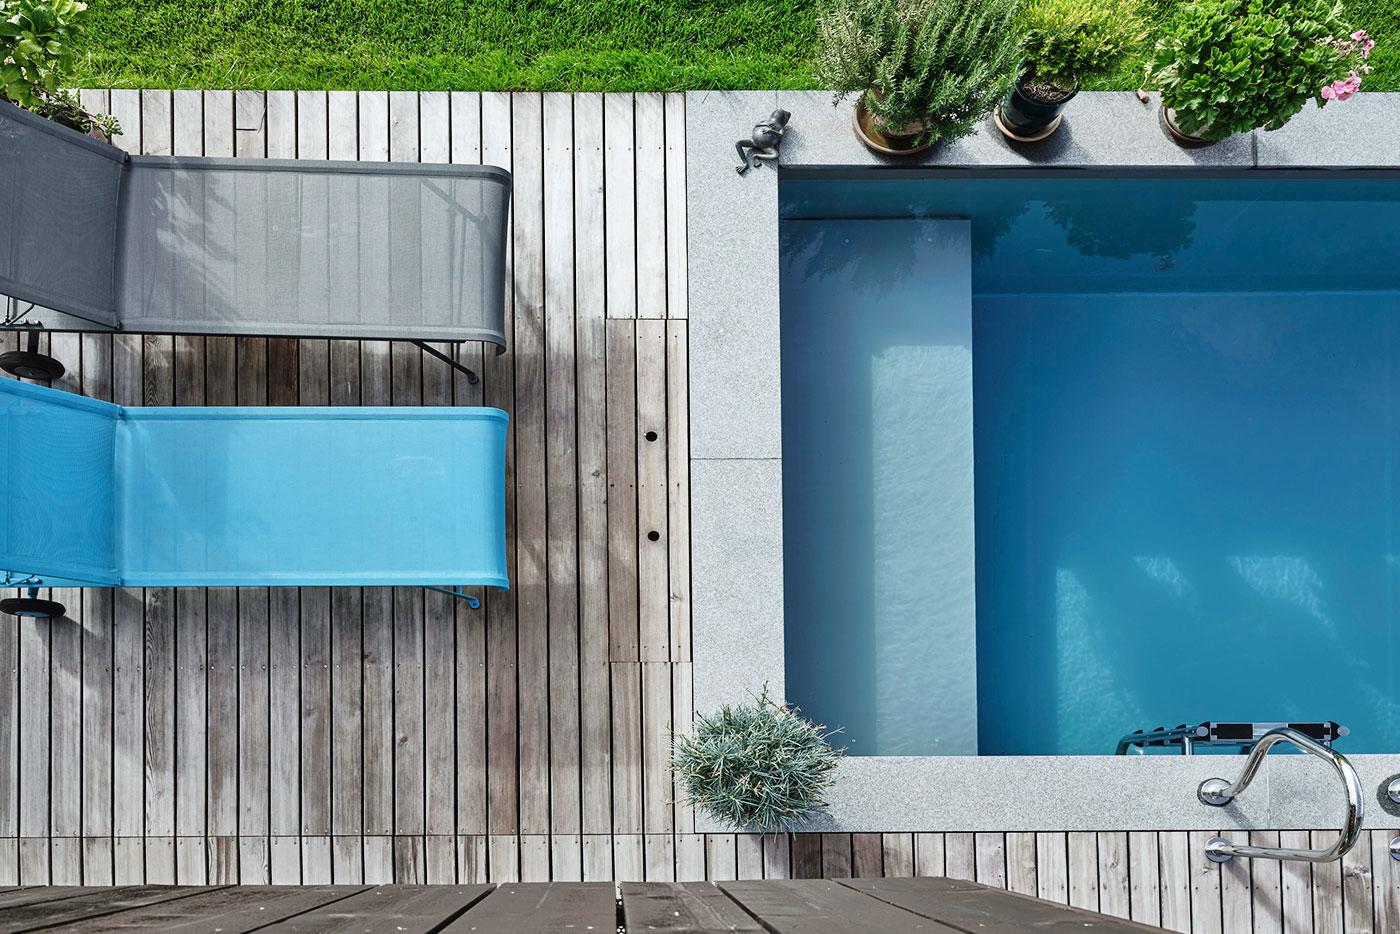 privat-k-niveko-sst-pool-referenz-03-SST-Saurwein-Schwimmbad-Technik